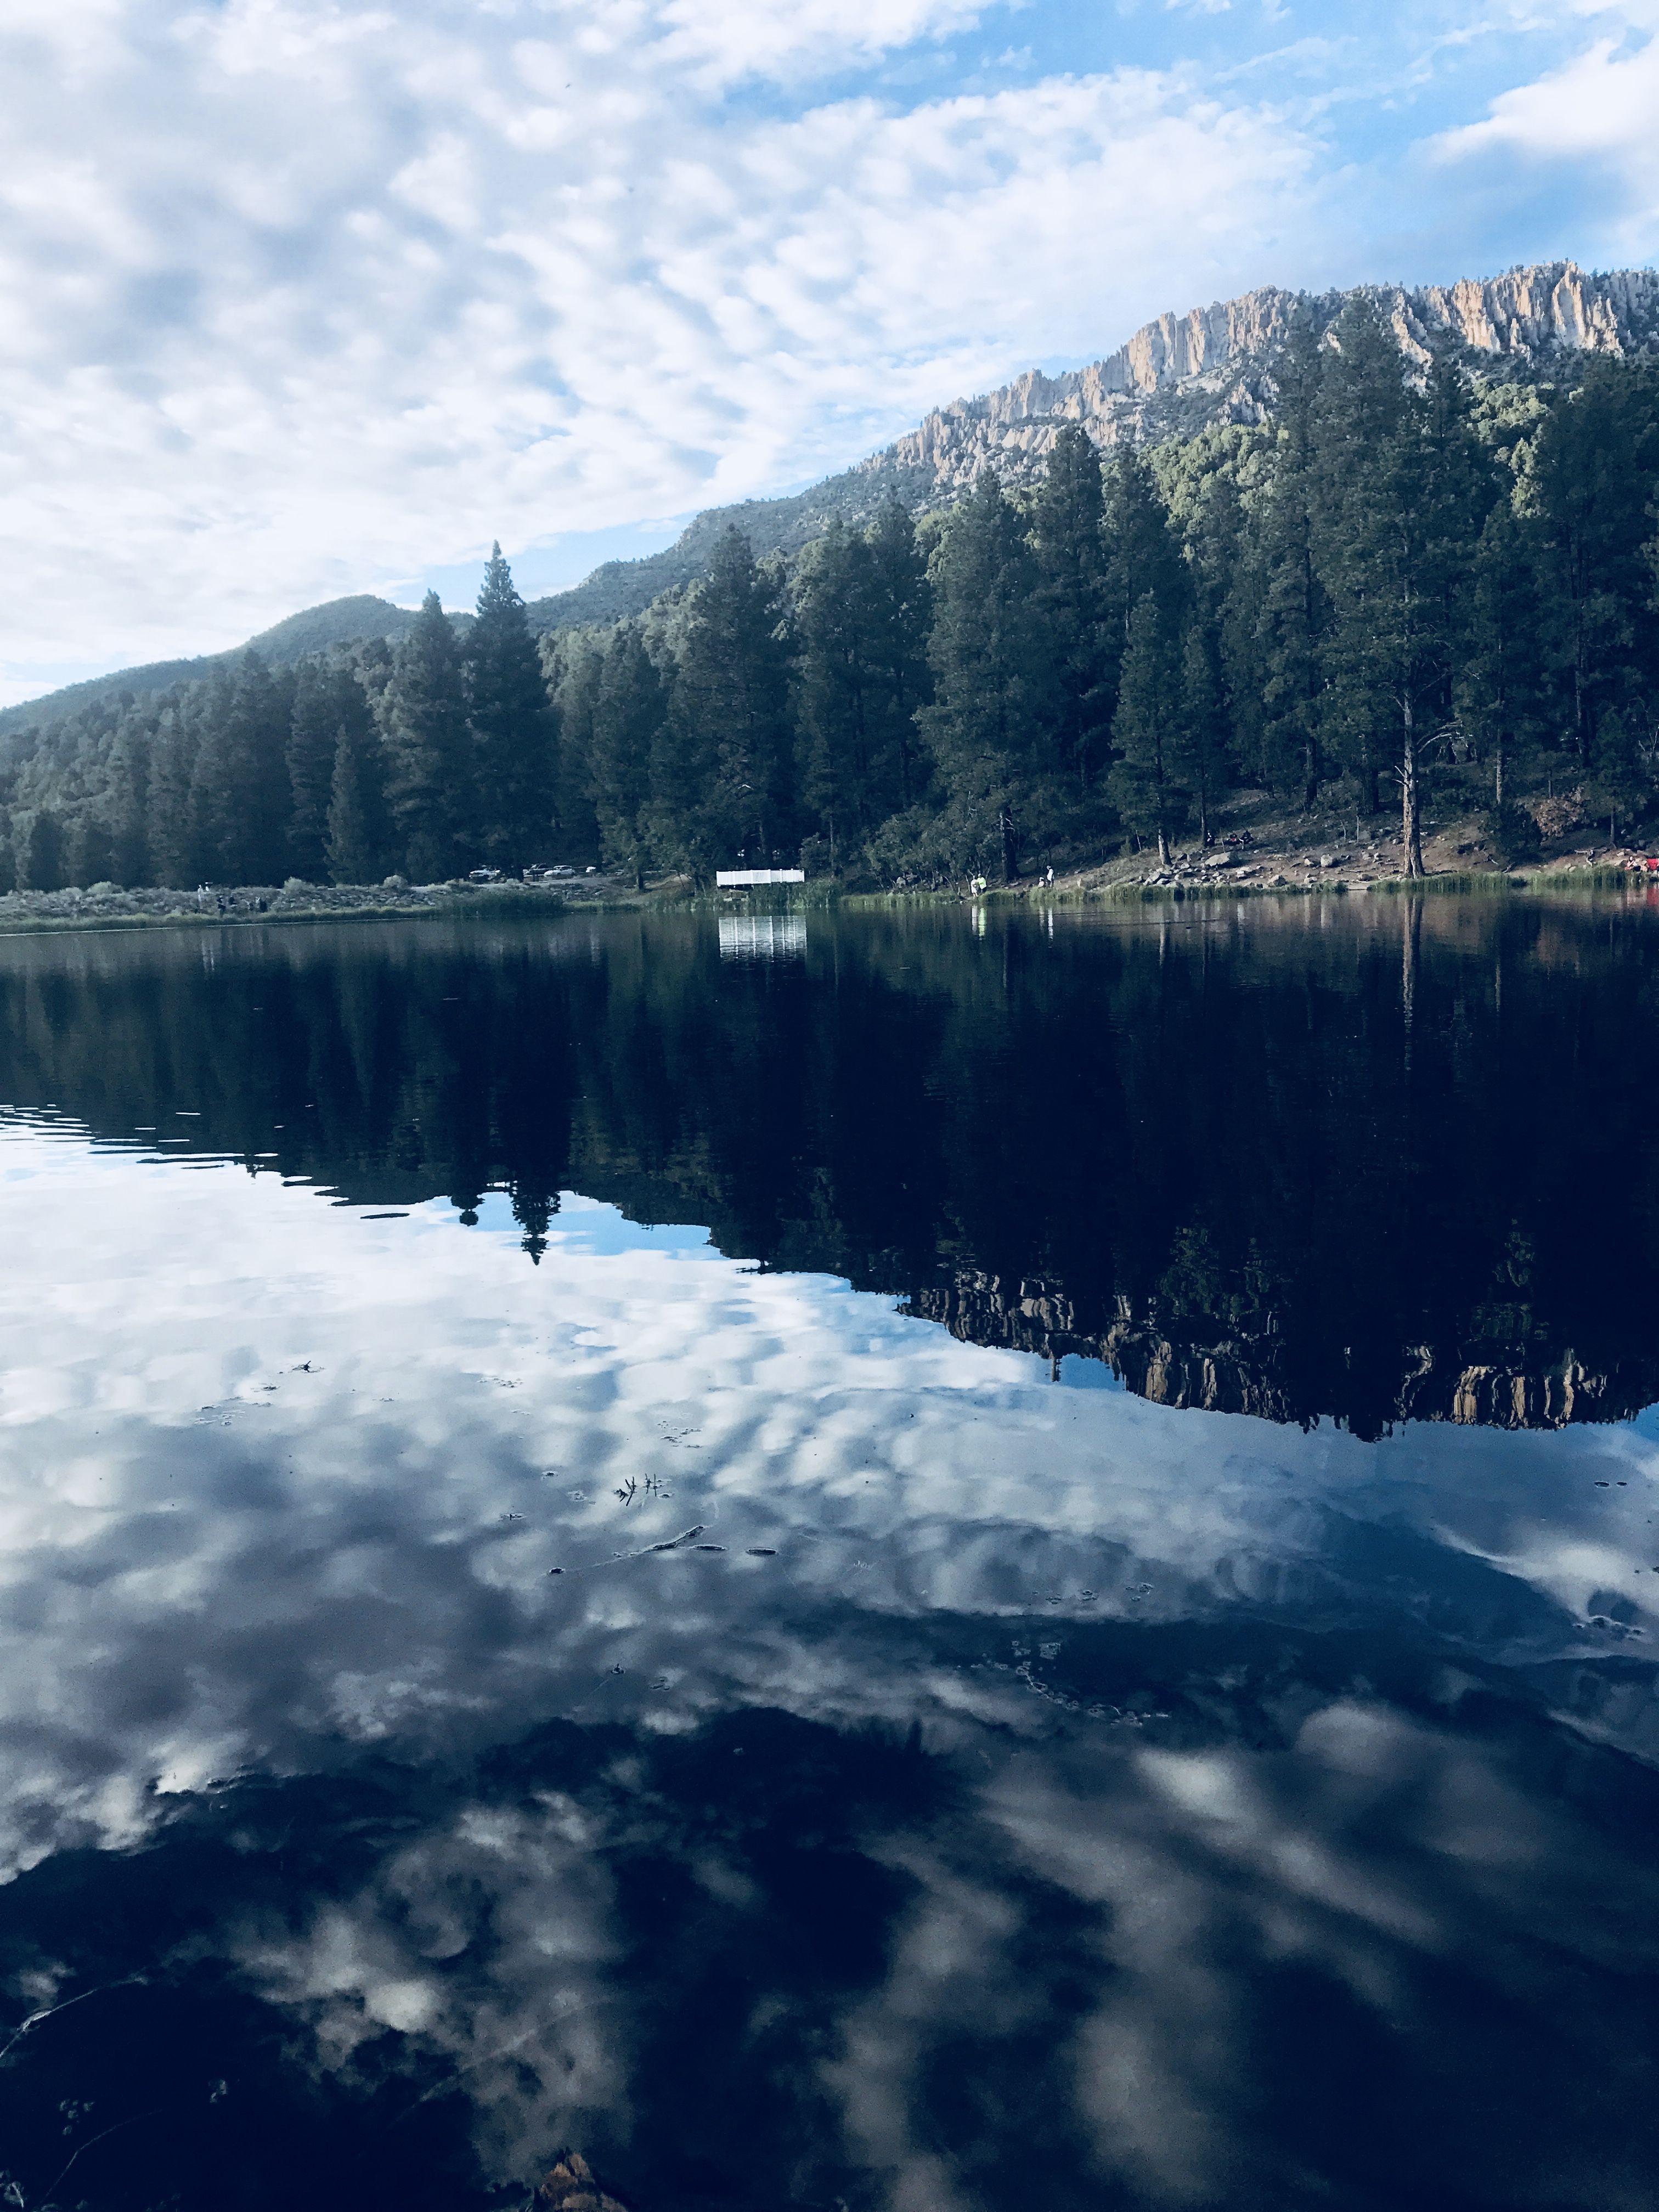 Pine Valley|Utah | Pine valley utah, Pine valley, Natural ...